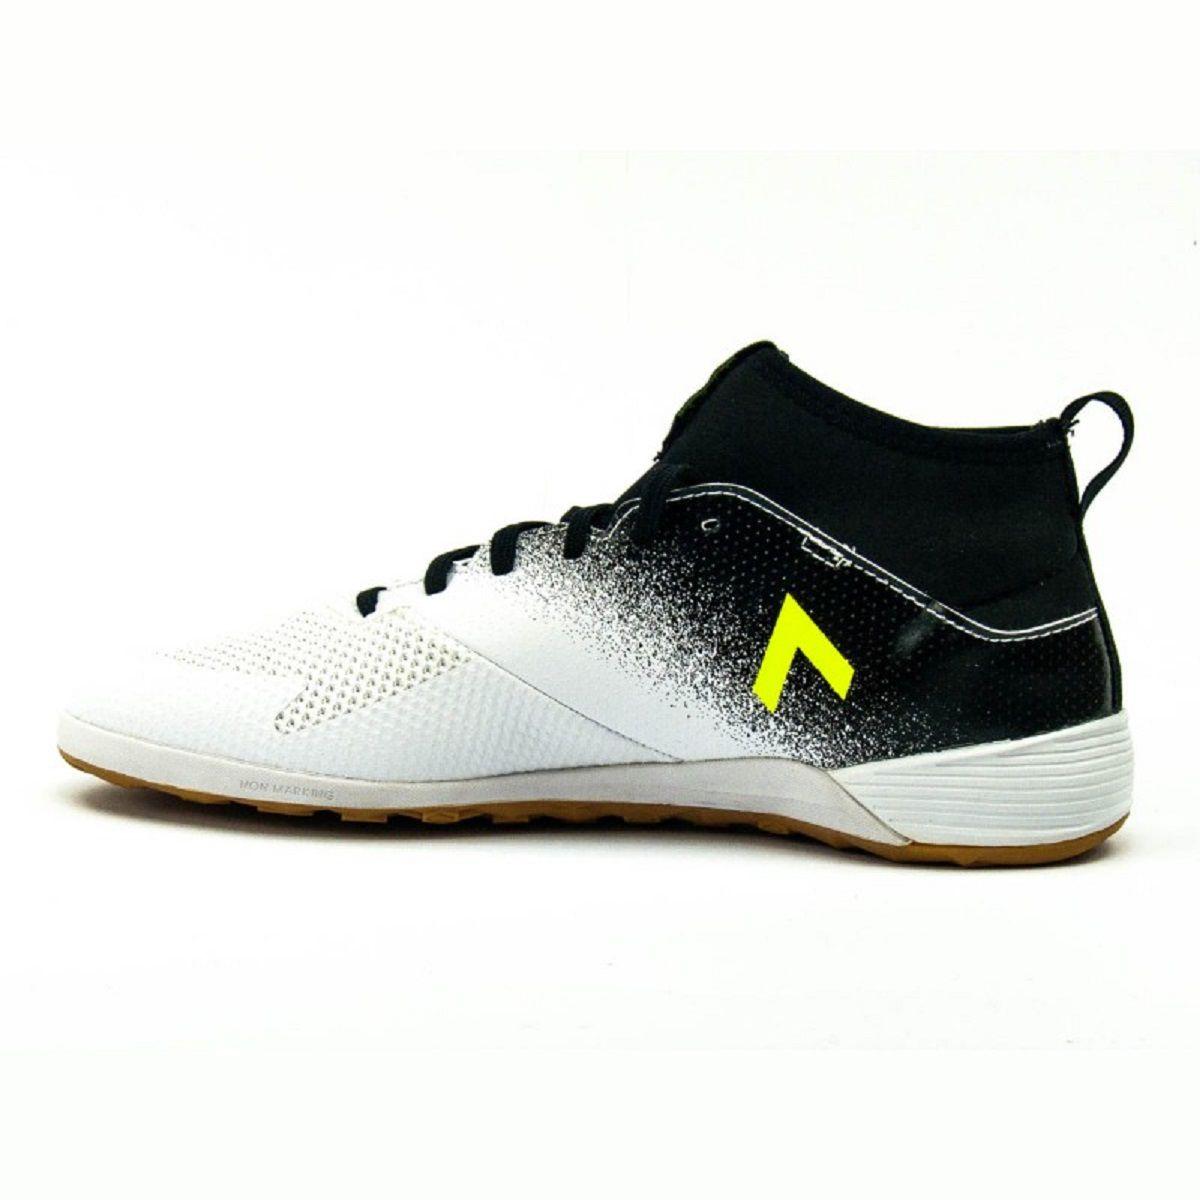 Chuteira Tenis Futsal Adidas Ace 17.3 IN